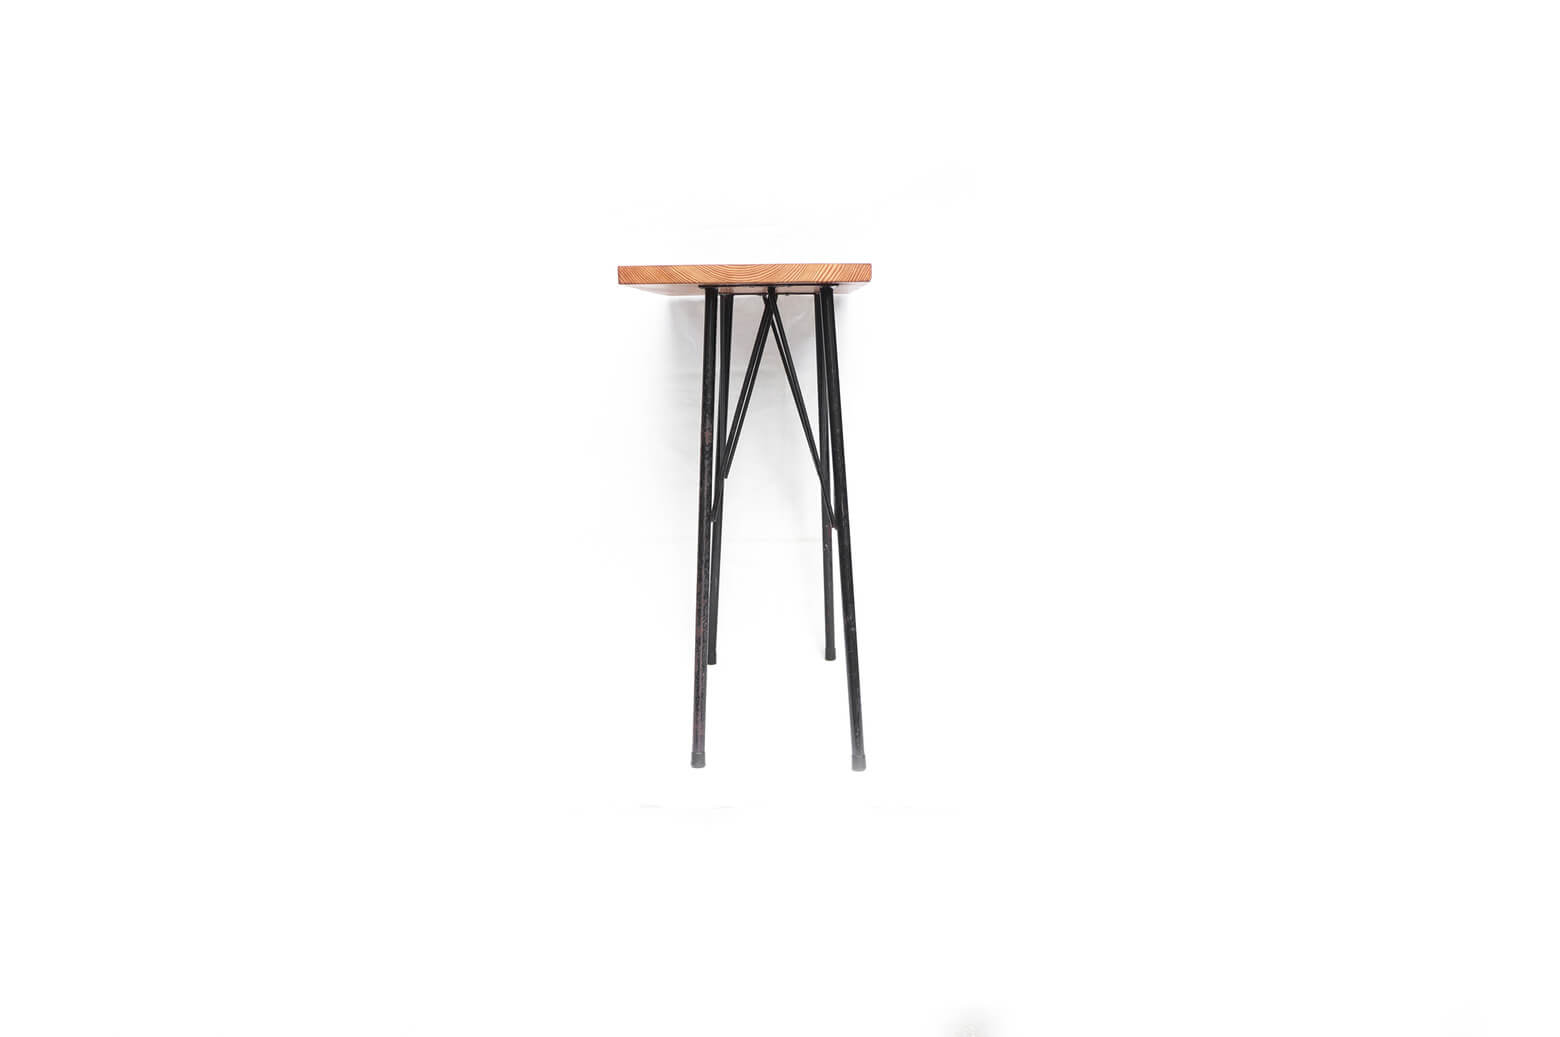 Solid wood Remake Table/無垢 一枚板 アイアンレッグテーブル 鉄脚 アンティーク インダストリアル ①